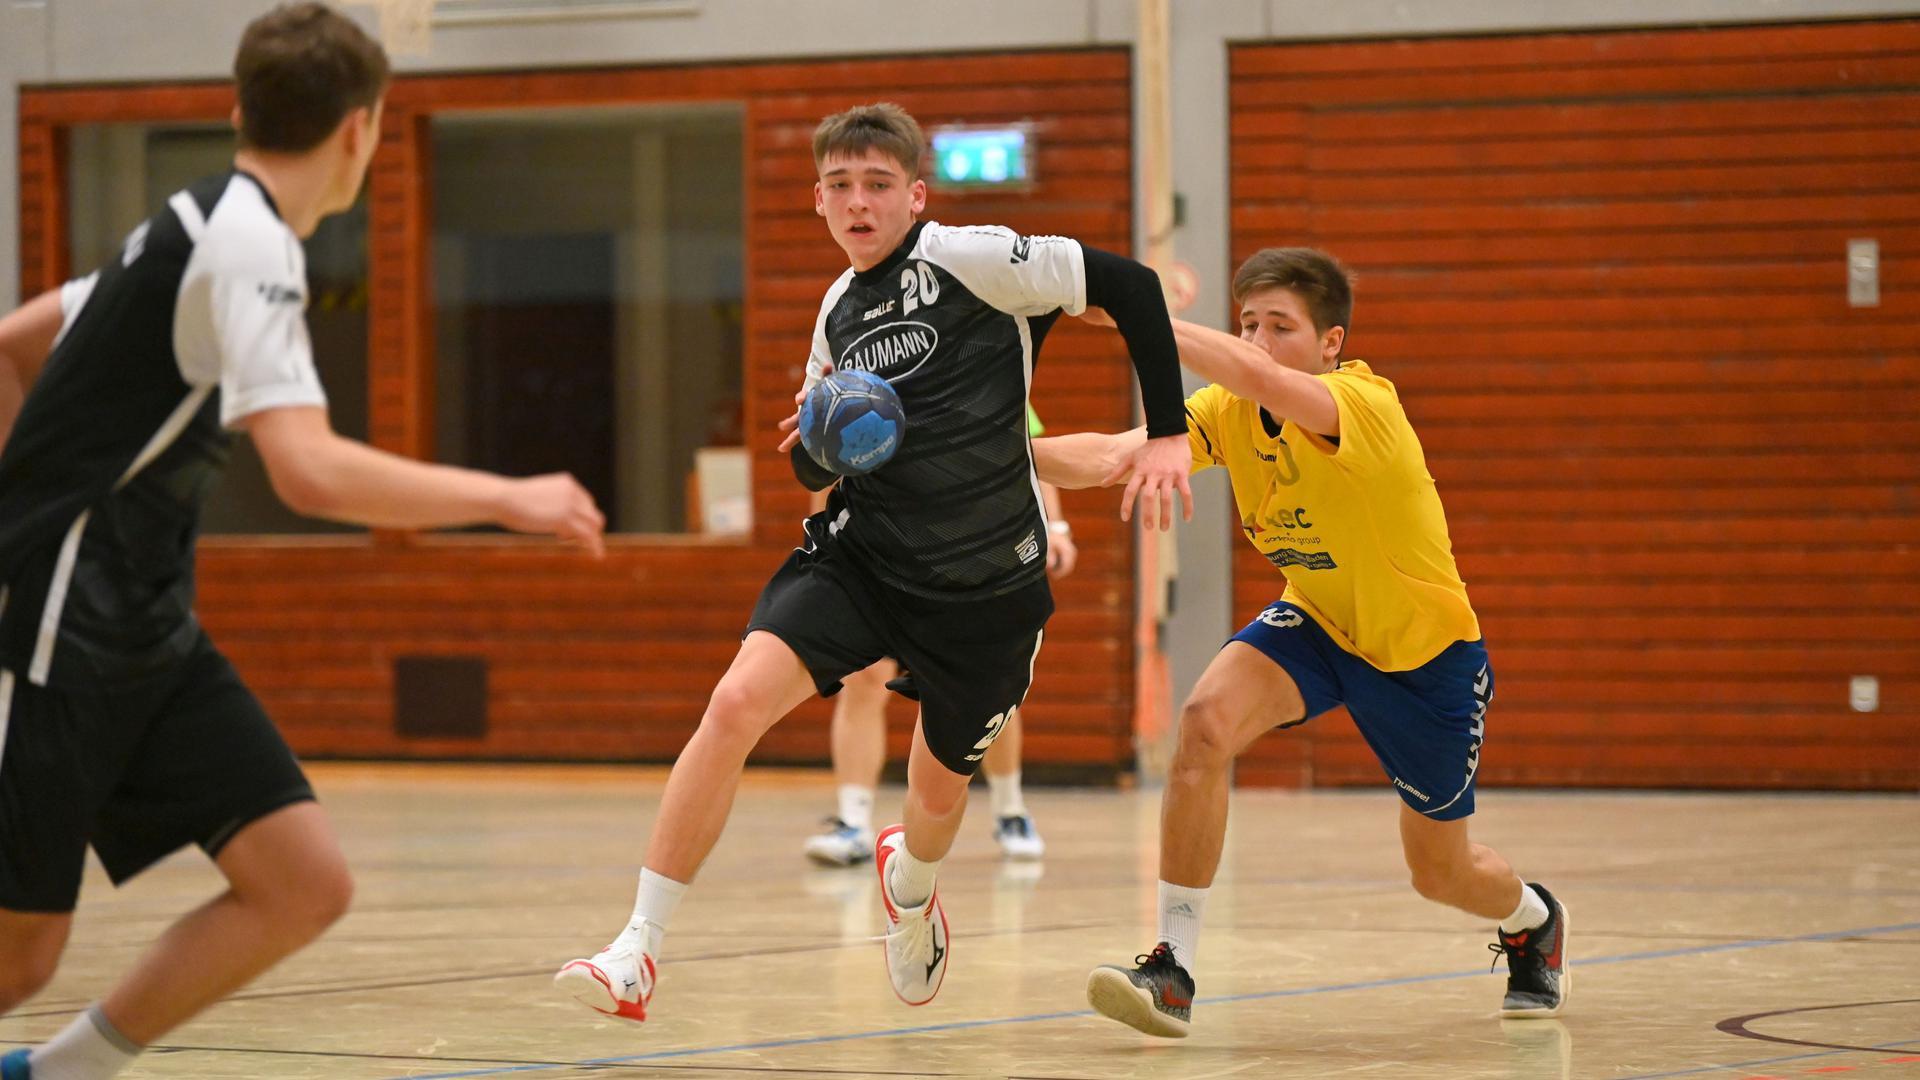 Handball-Szene